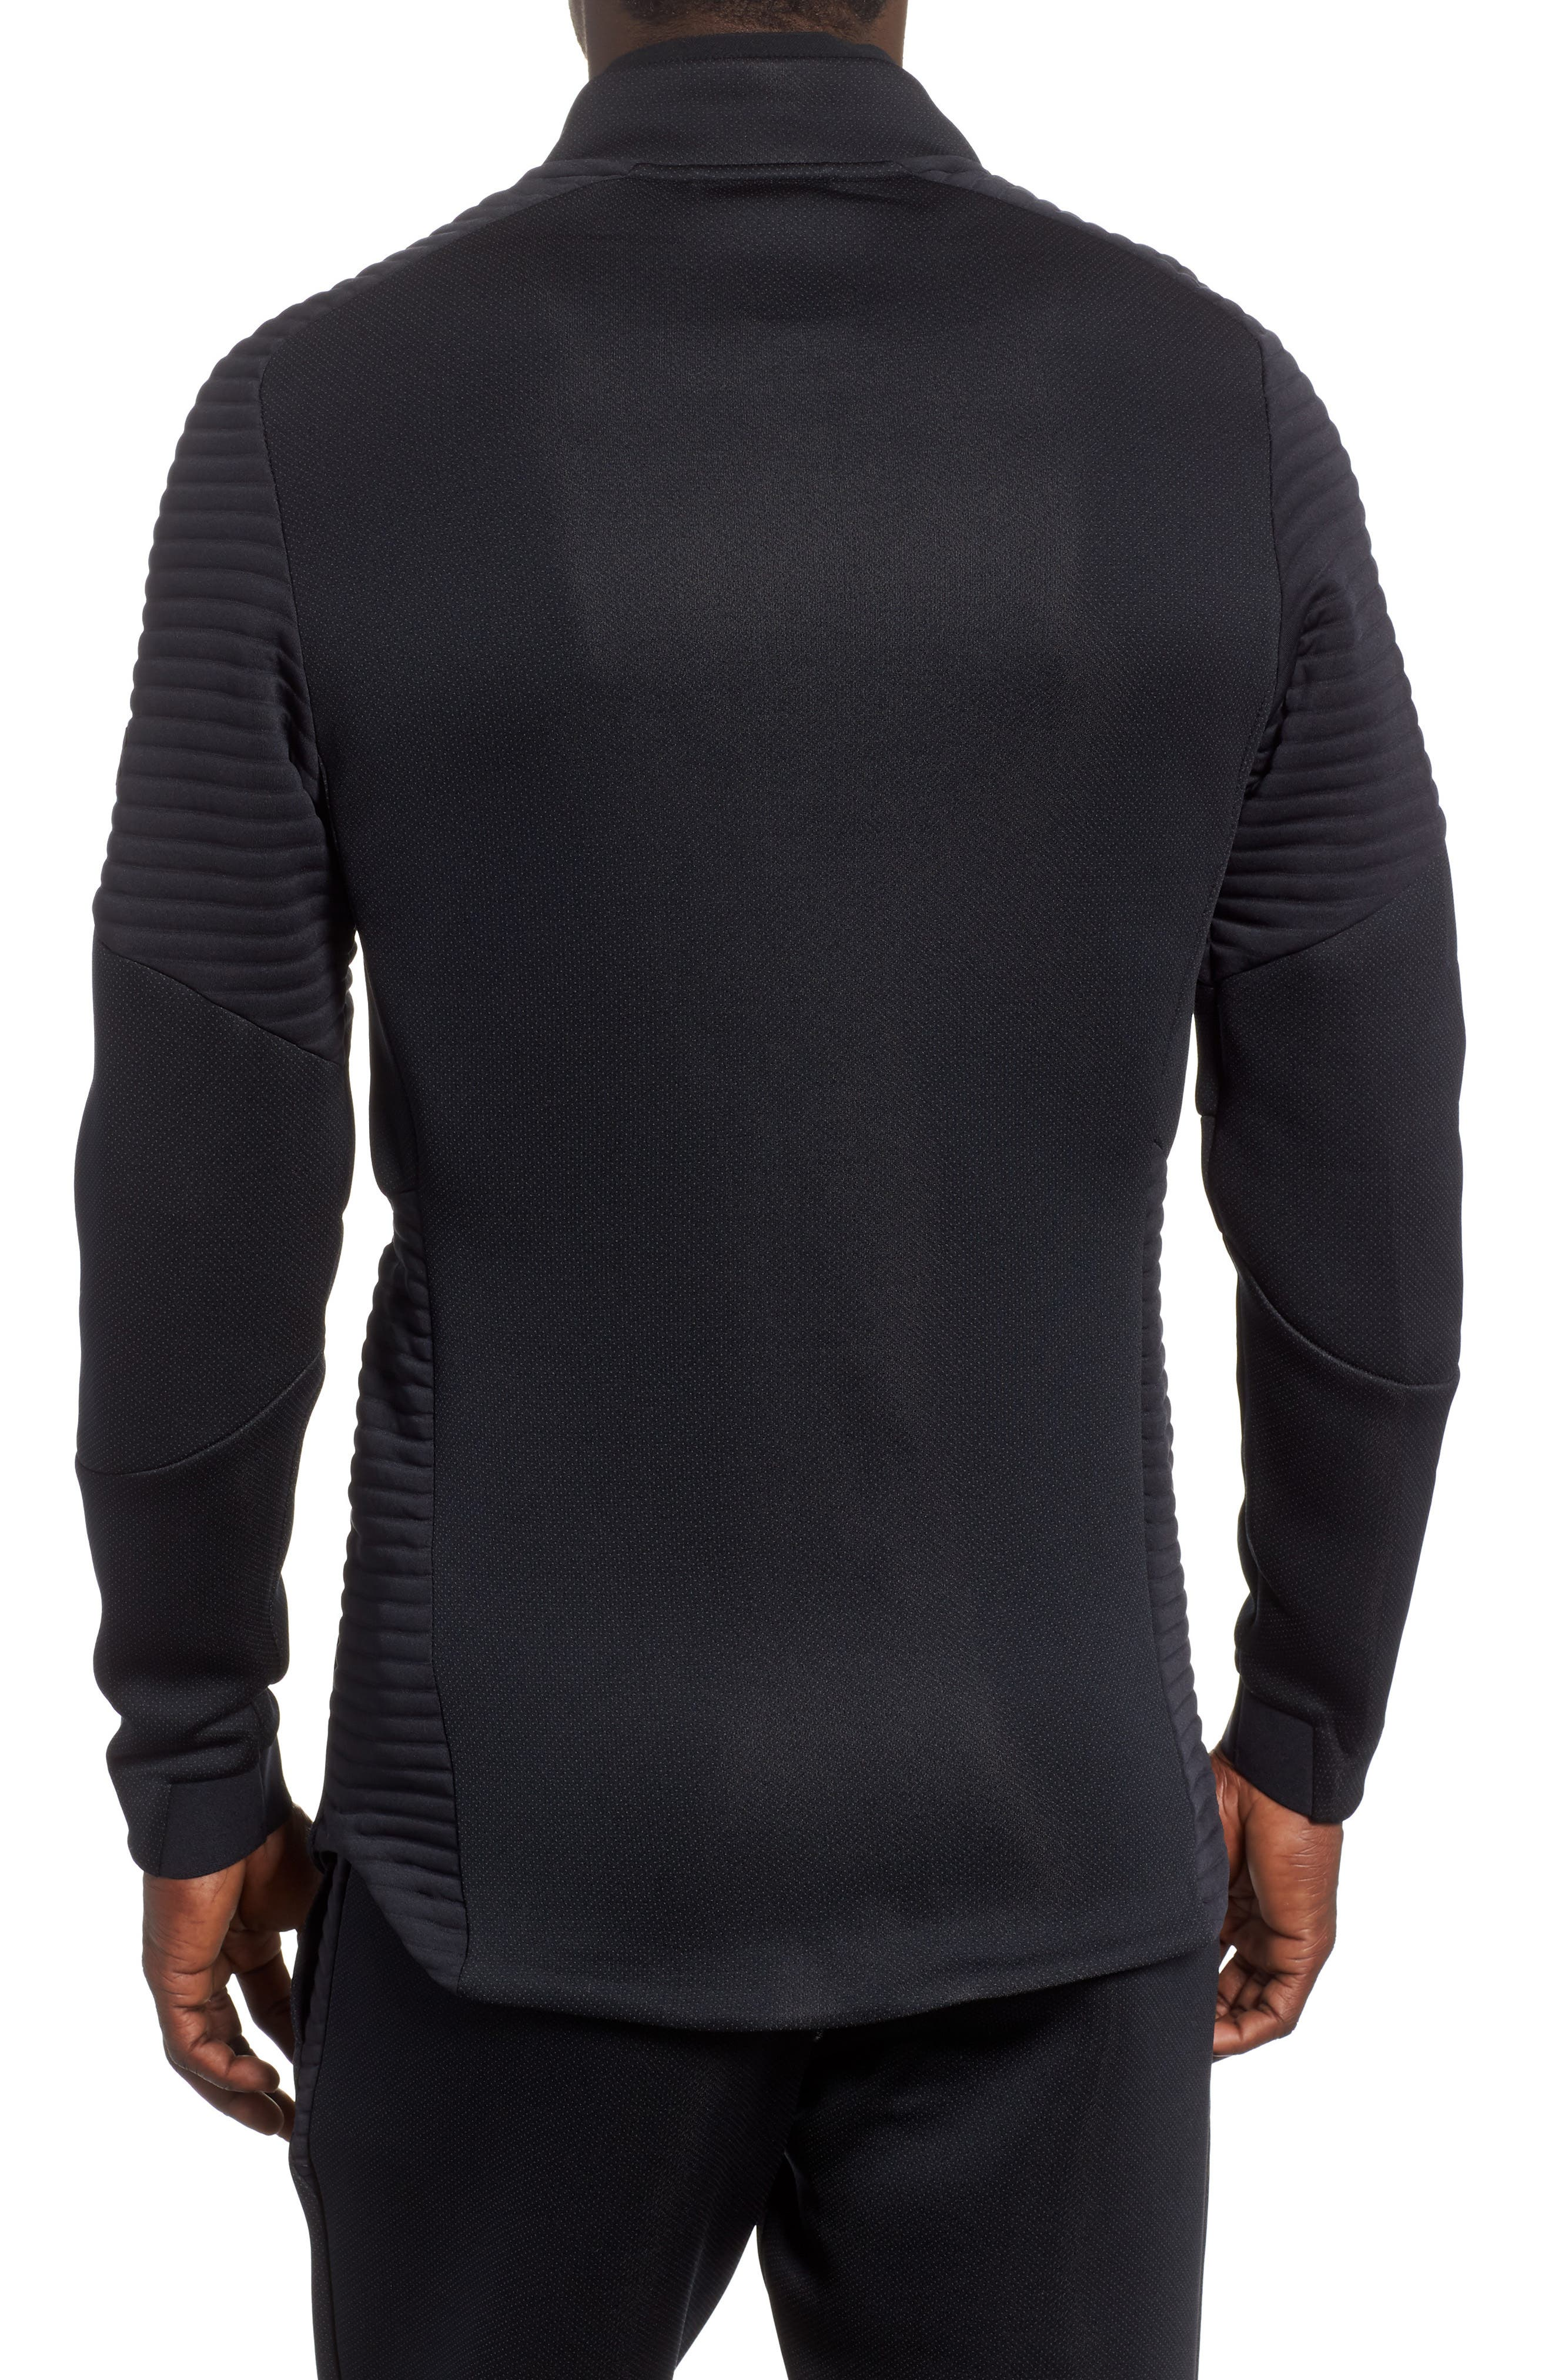 Unstoppable /MOVE Jacket,                             Alternate thumbnail 2, color,                             BLACK/ CHARCOAL/ BLACK